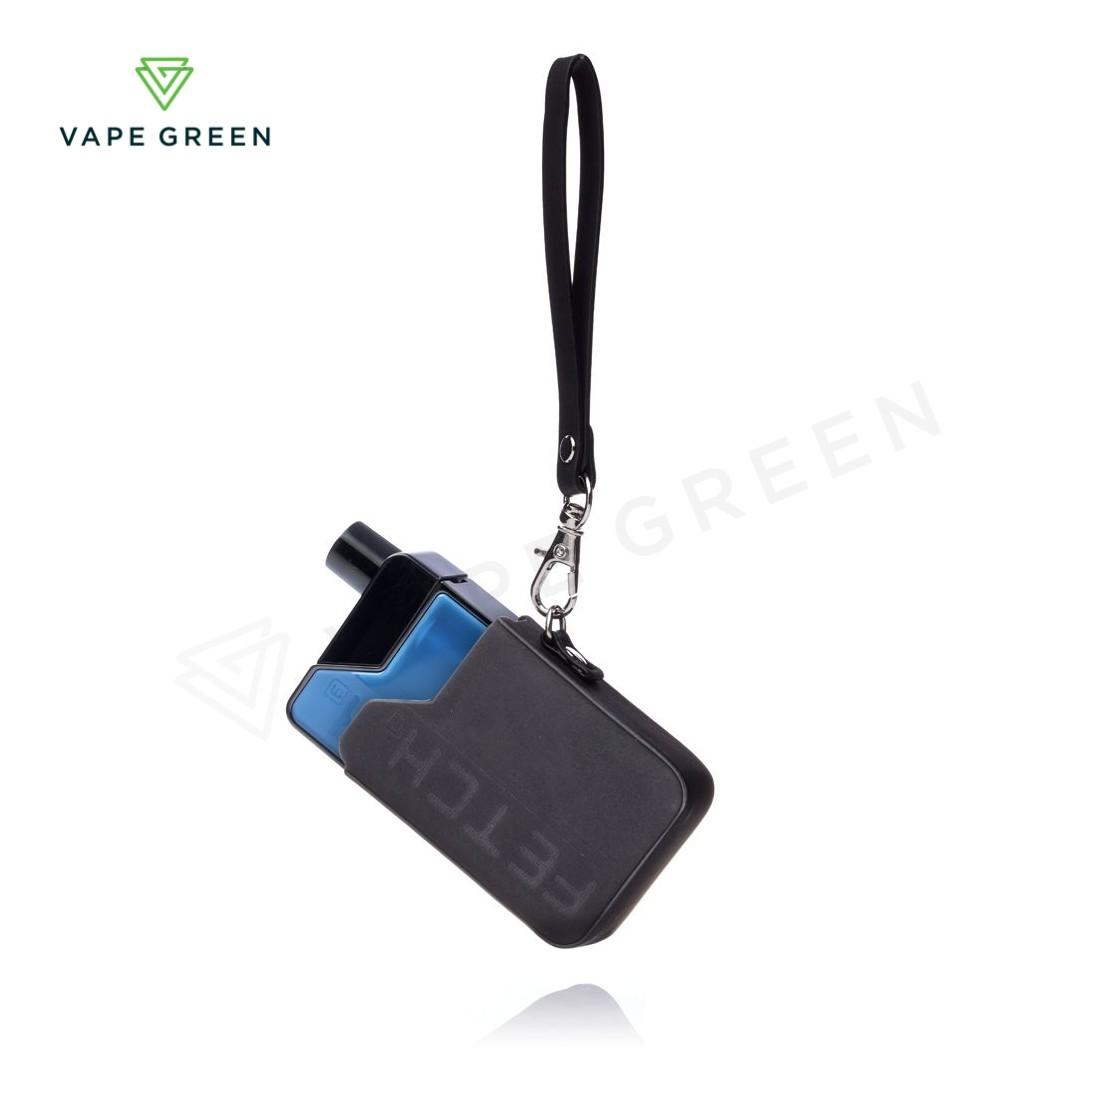 Smok Fetch Mini Leather Case